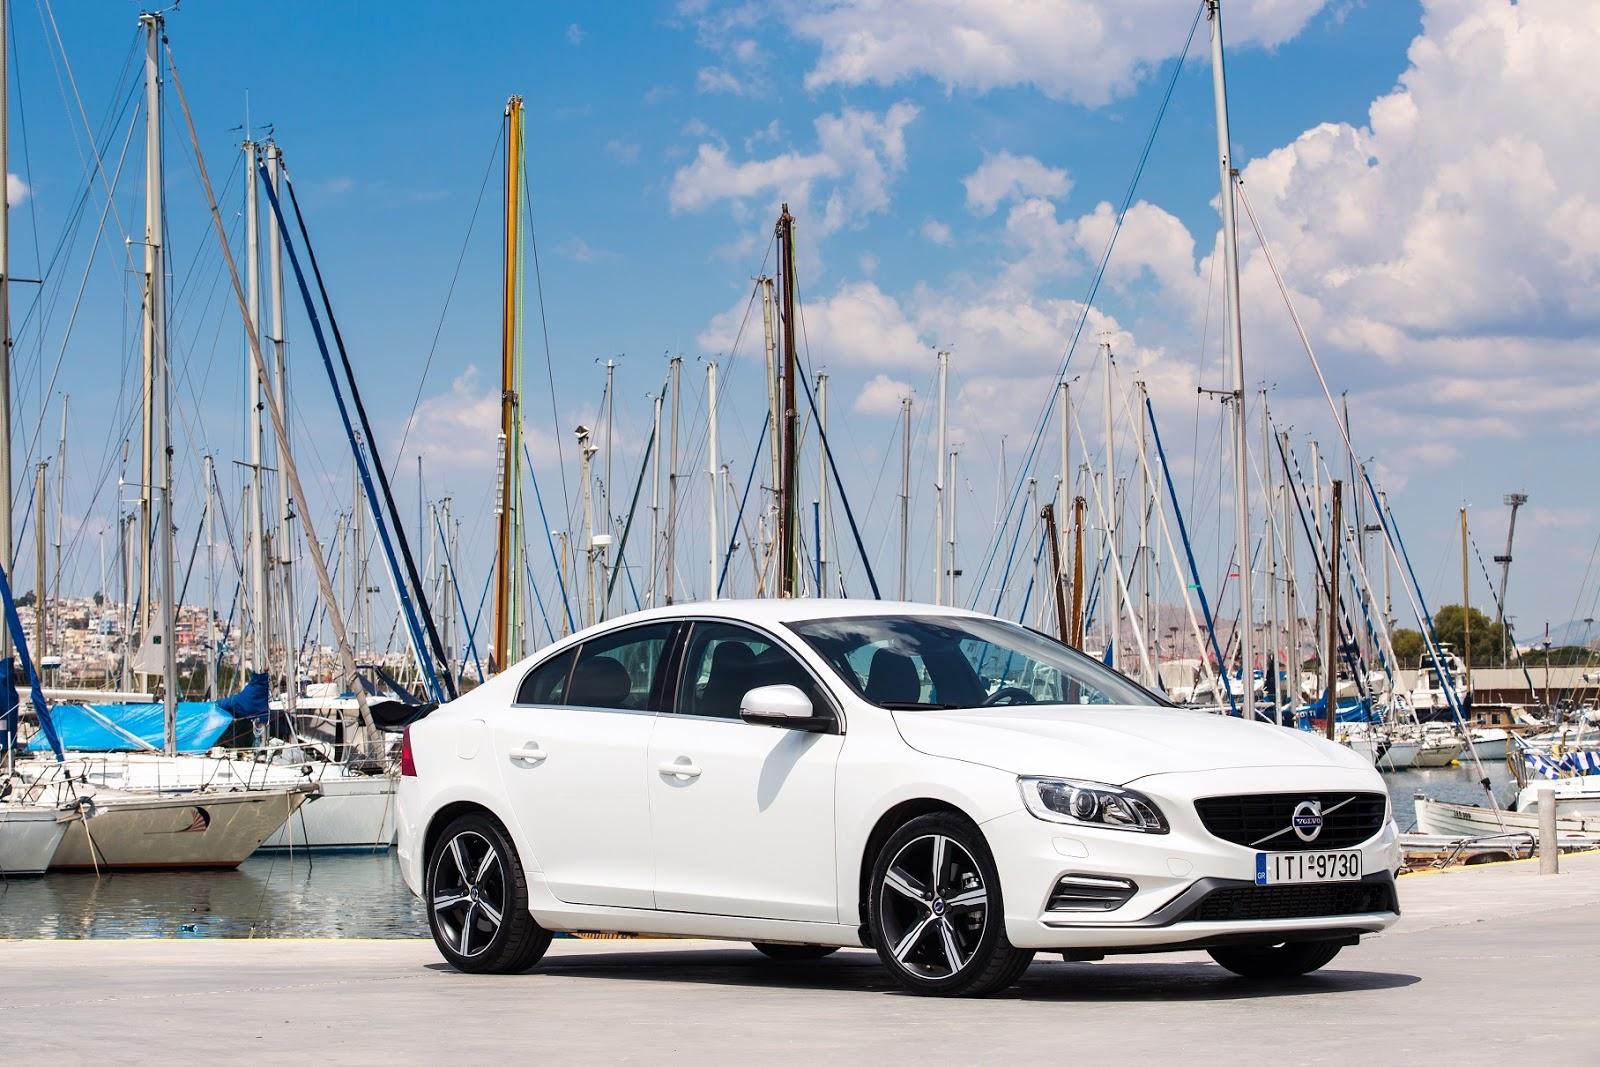 VOLVO2BS602BT32B1.52BAUTO 1 10 σημεία που κάνουν τα Volvo S60 και V60 την πληρέστερη πρόταση premium sedan, sedan, Station Wagon, Volvo, Volvo Car Hellas, Volvo Cars, Volvo S60, Volvo V60